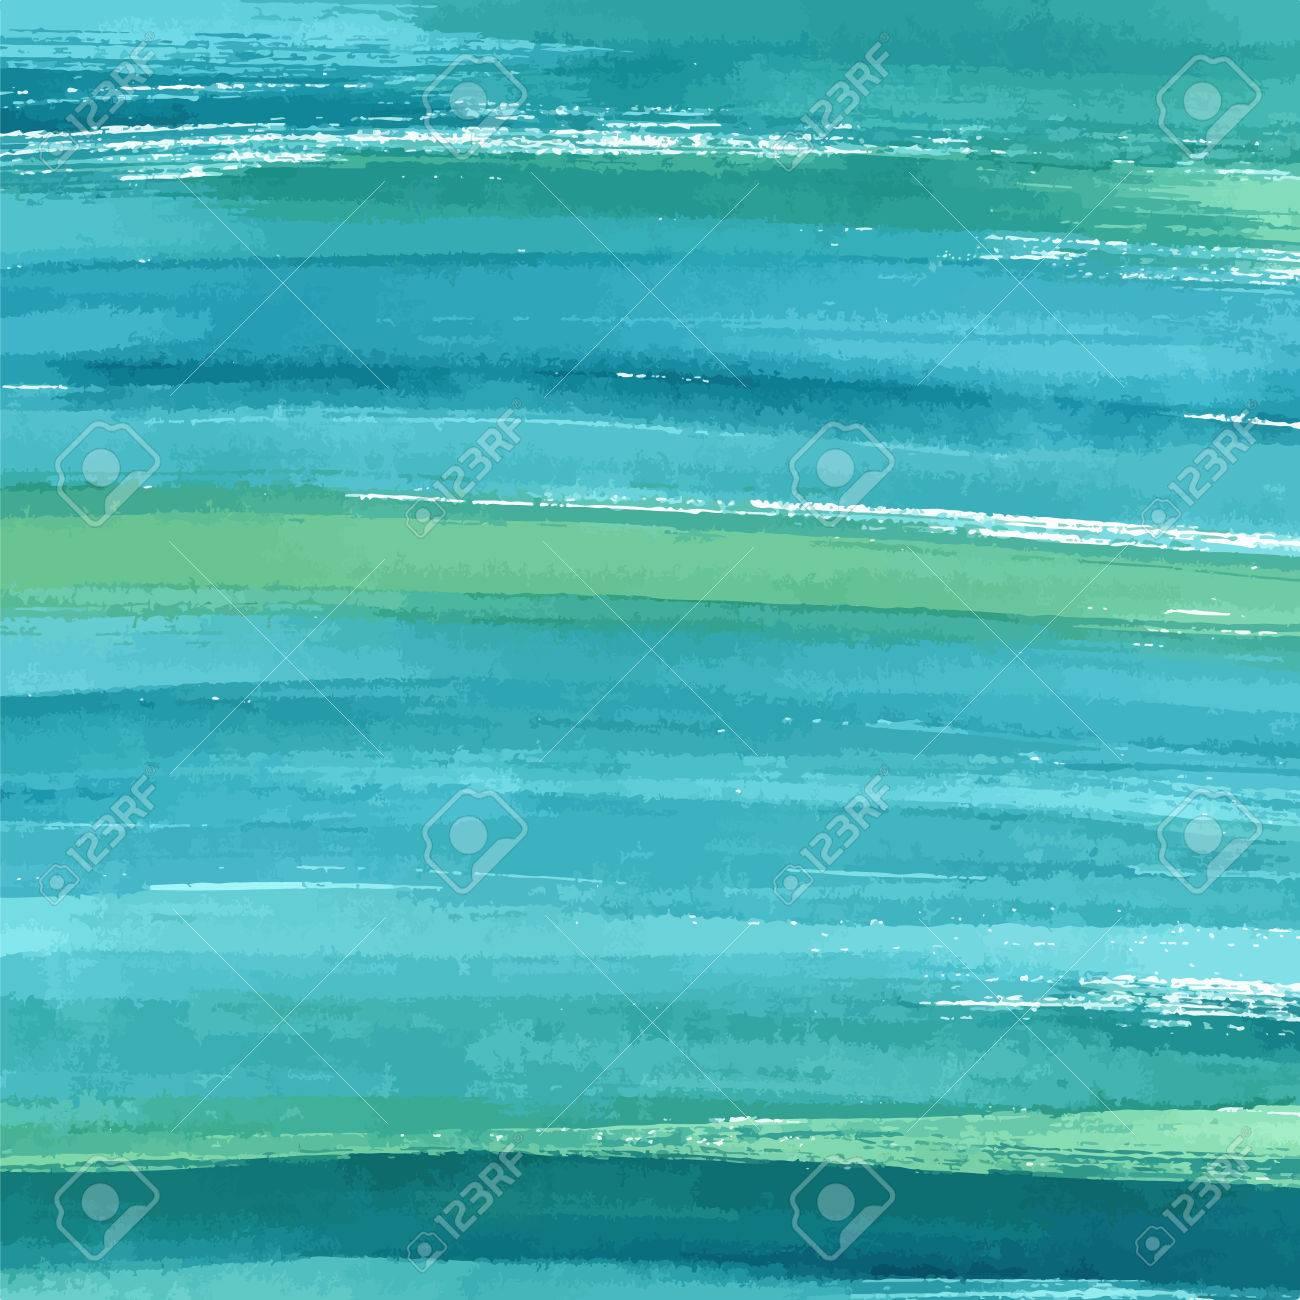 dibujado a mano azul turquesa acuarela abstracta textura de la pintura vector del fondo del